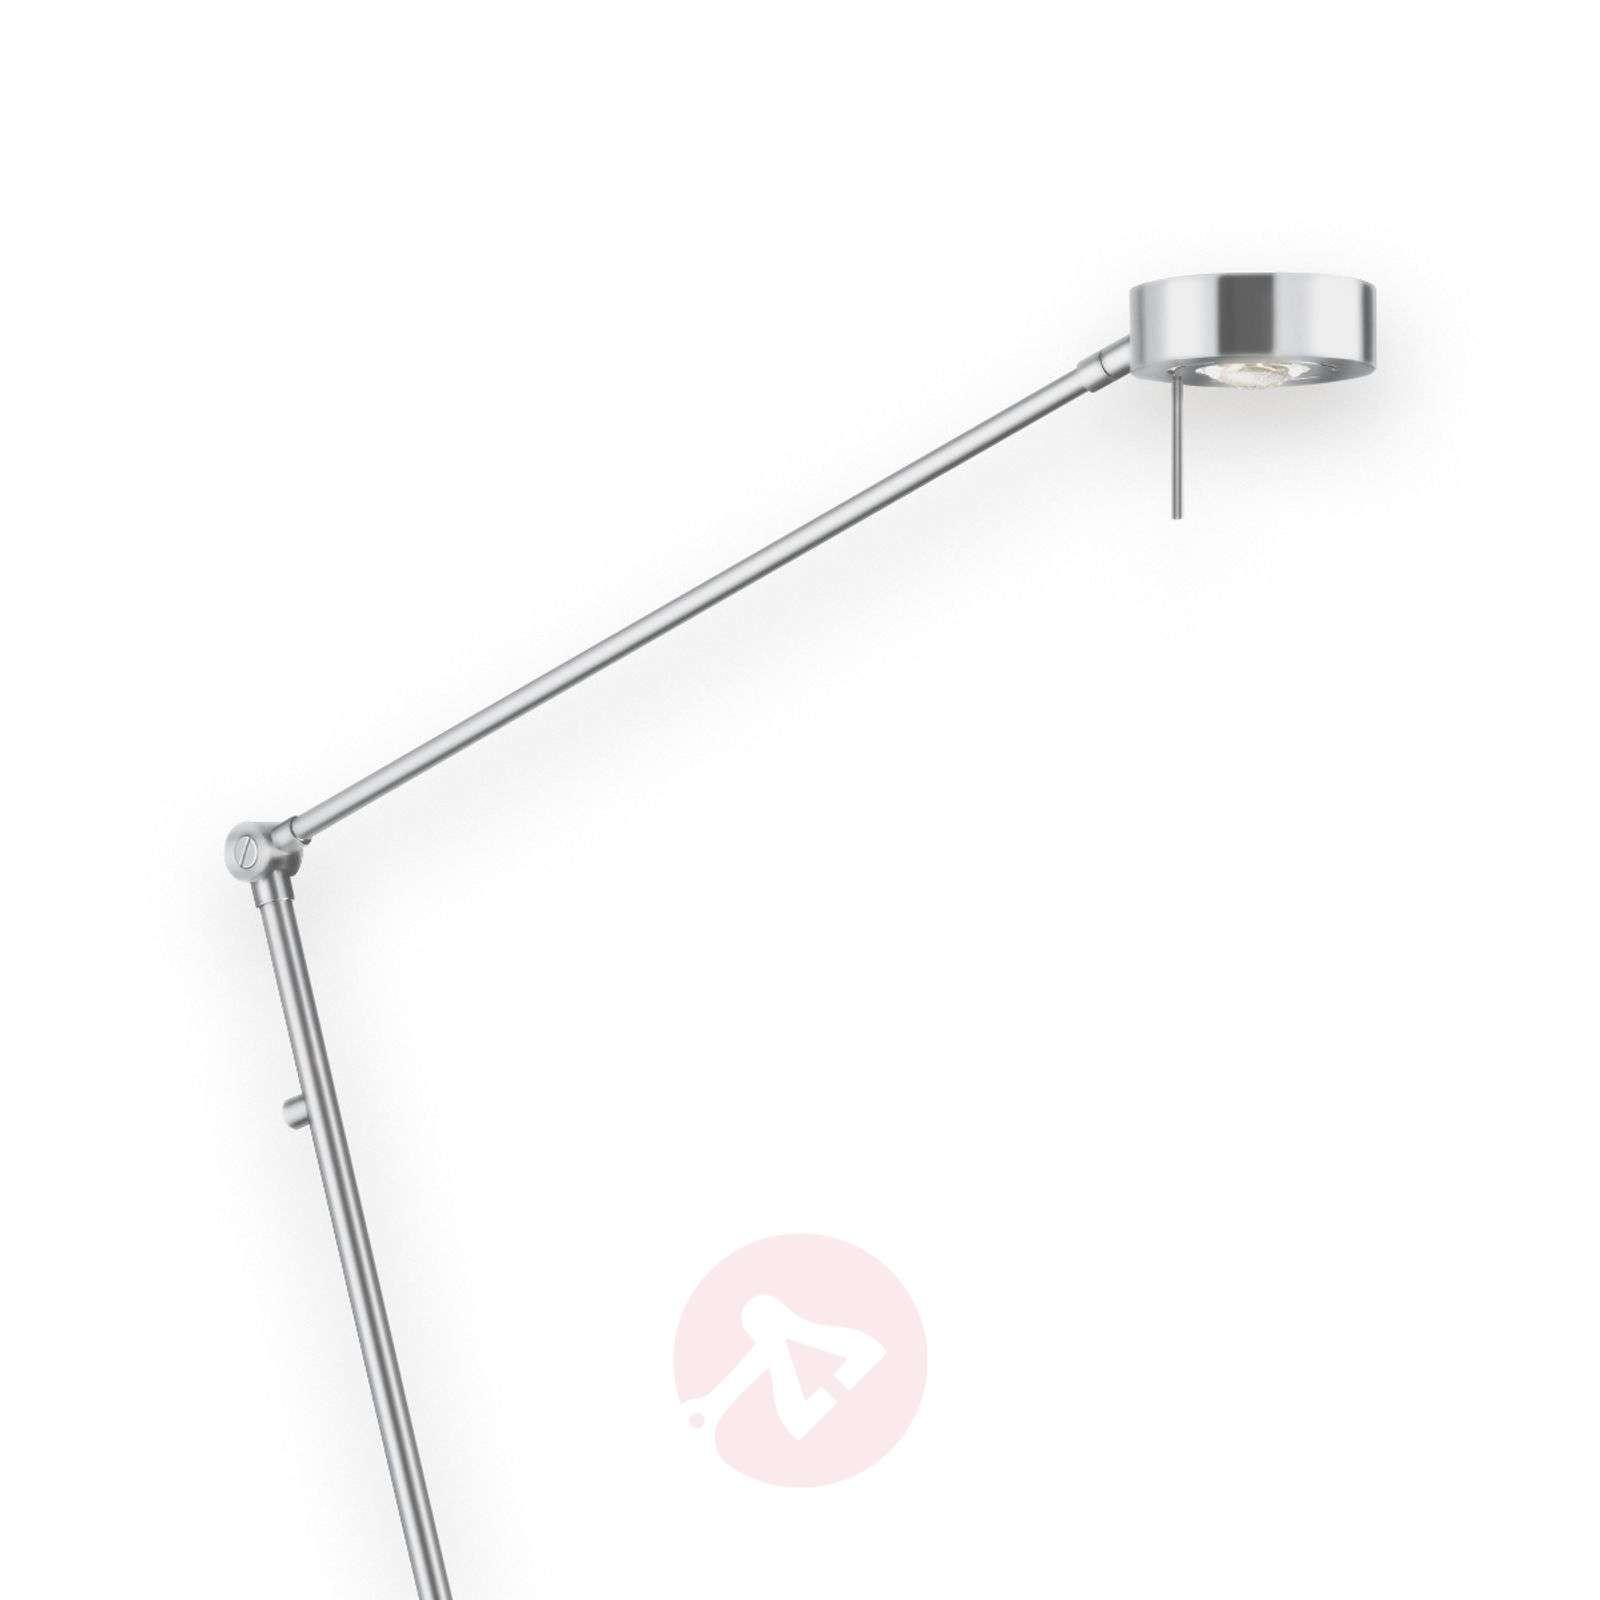 Kapea LED-lattiavalaisin Elegance, 3-nivelinen-4002534X-03